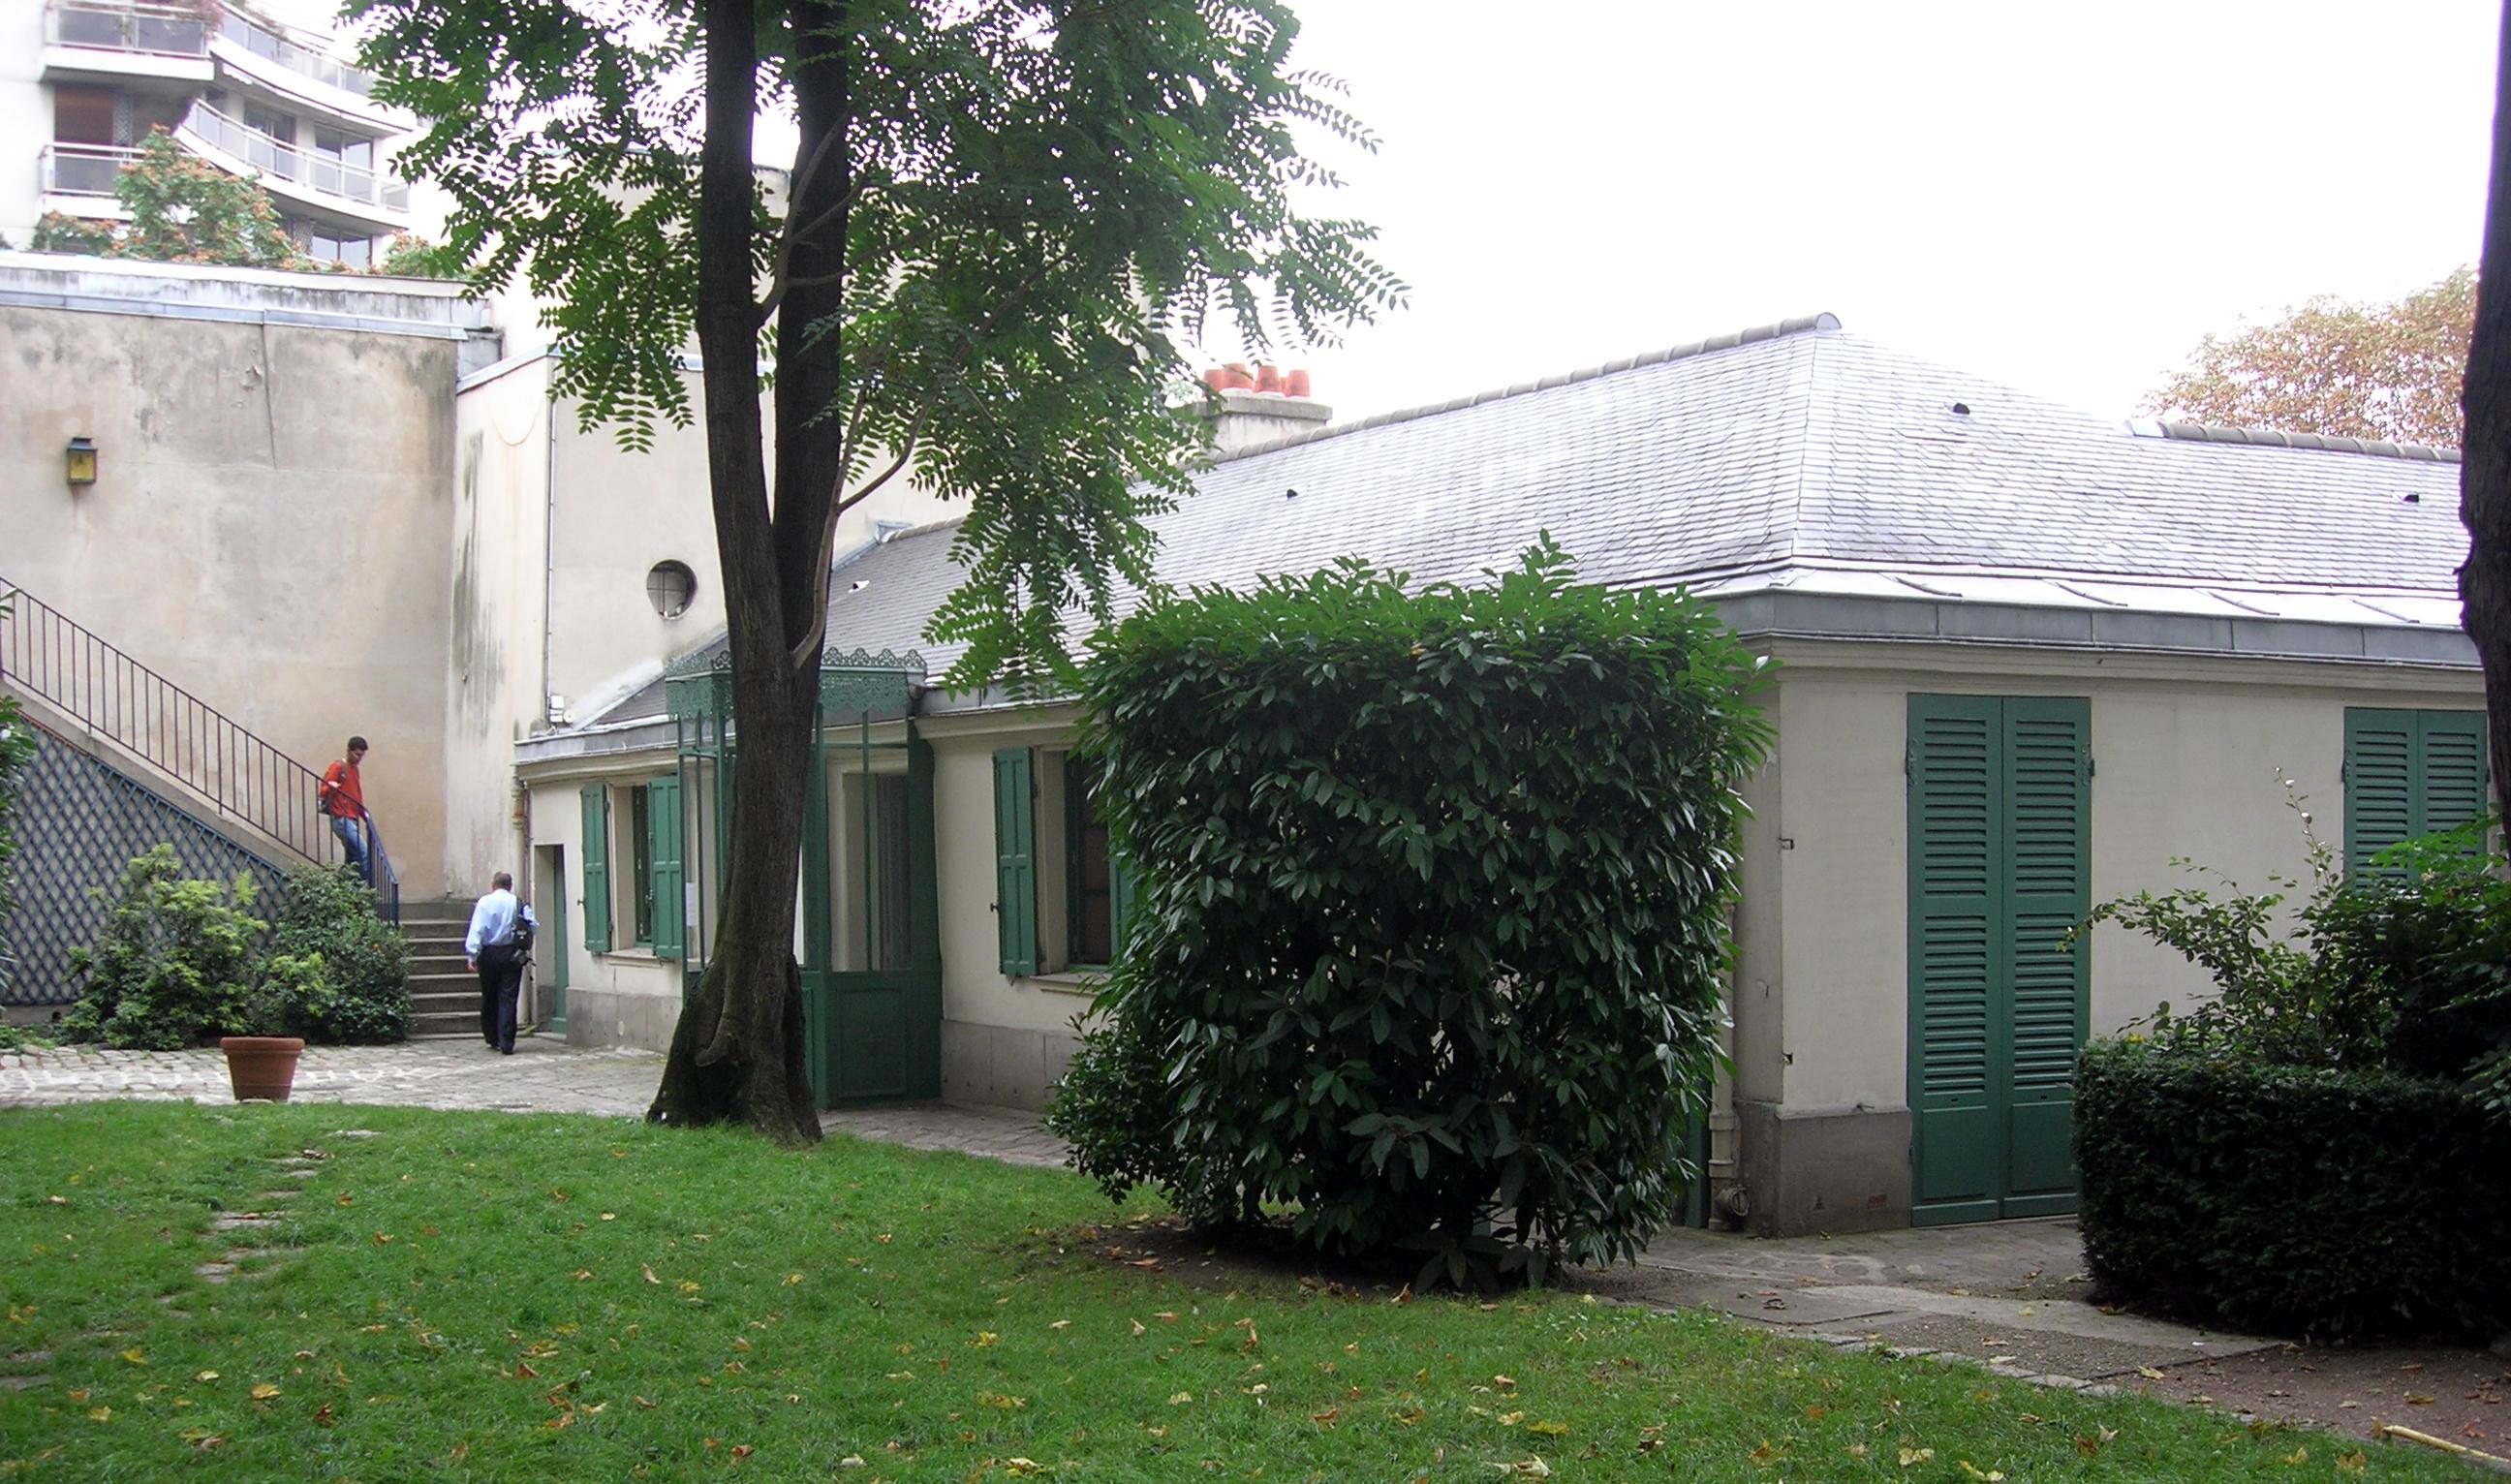 Maison de Balzac – Wikipedia